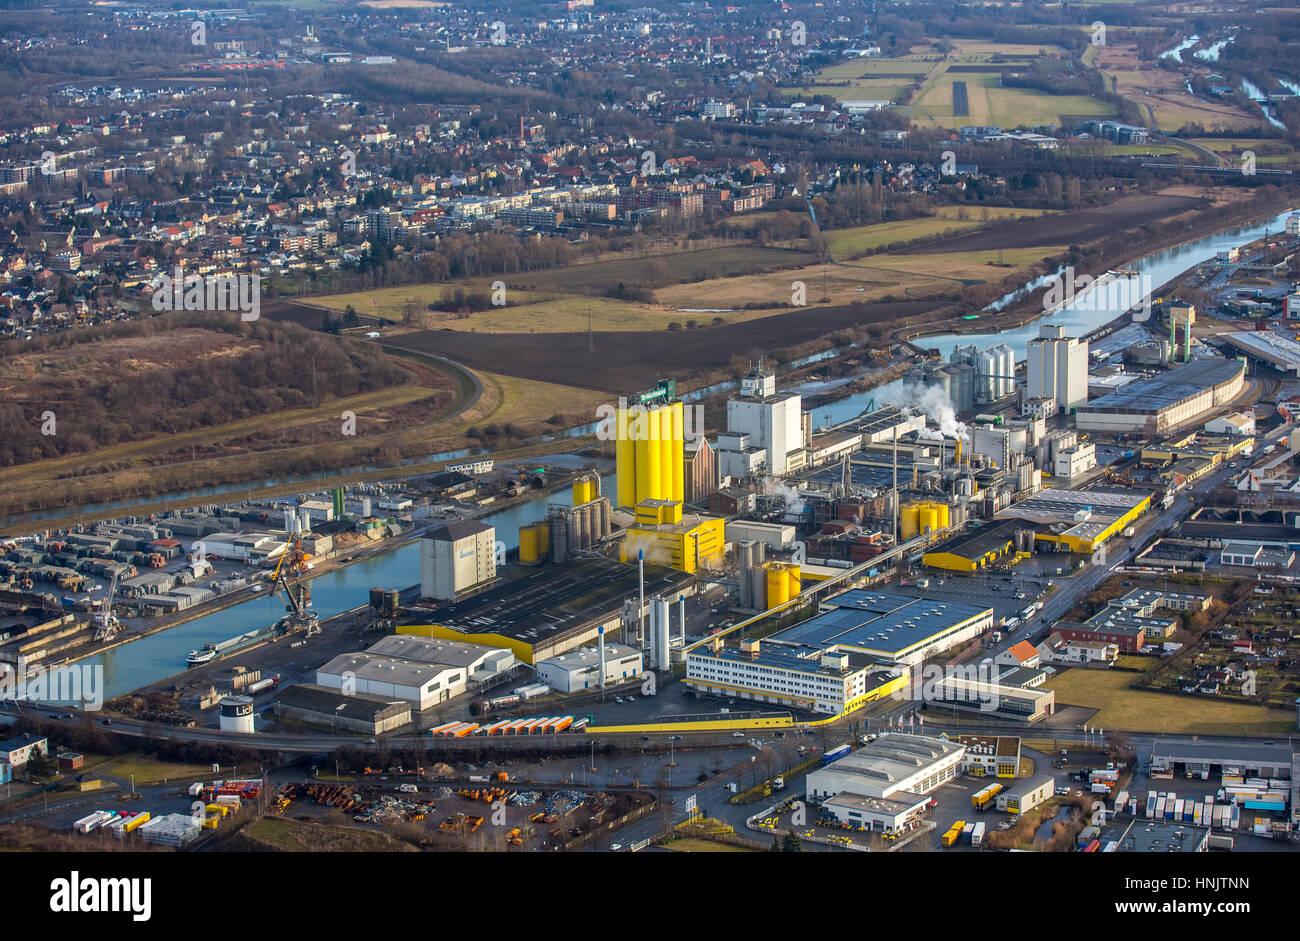 Hamm harbor, oil mill Brökelmann, oil producer, Hamm, Ruhr area, North Rhine-Westphalia, Germany - Stock Image